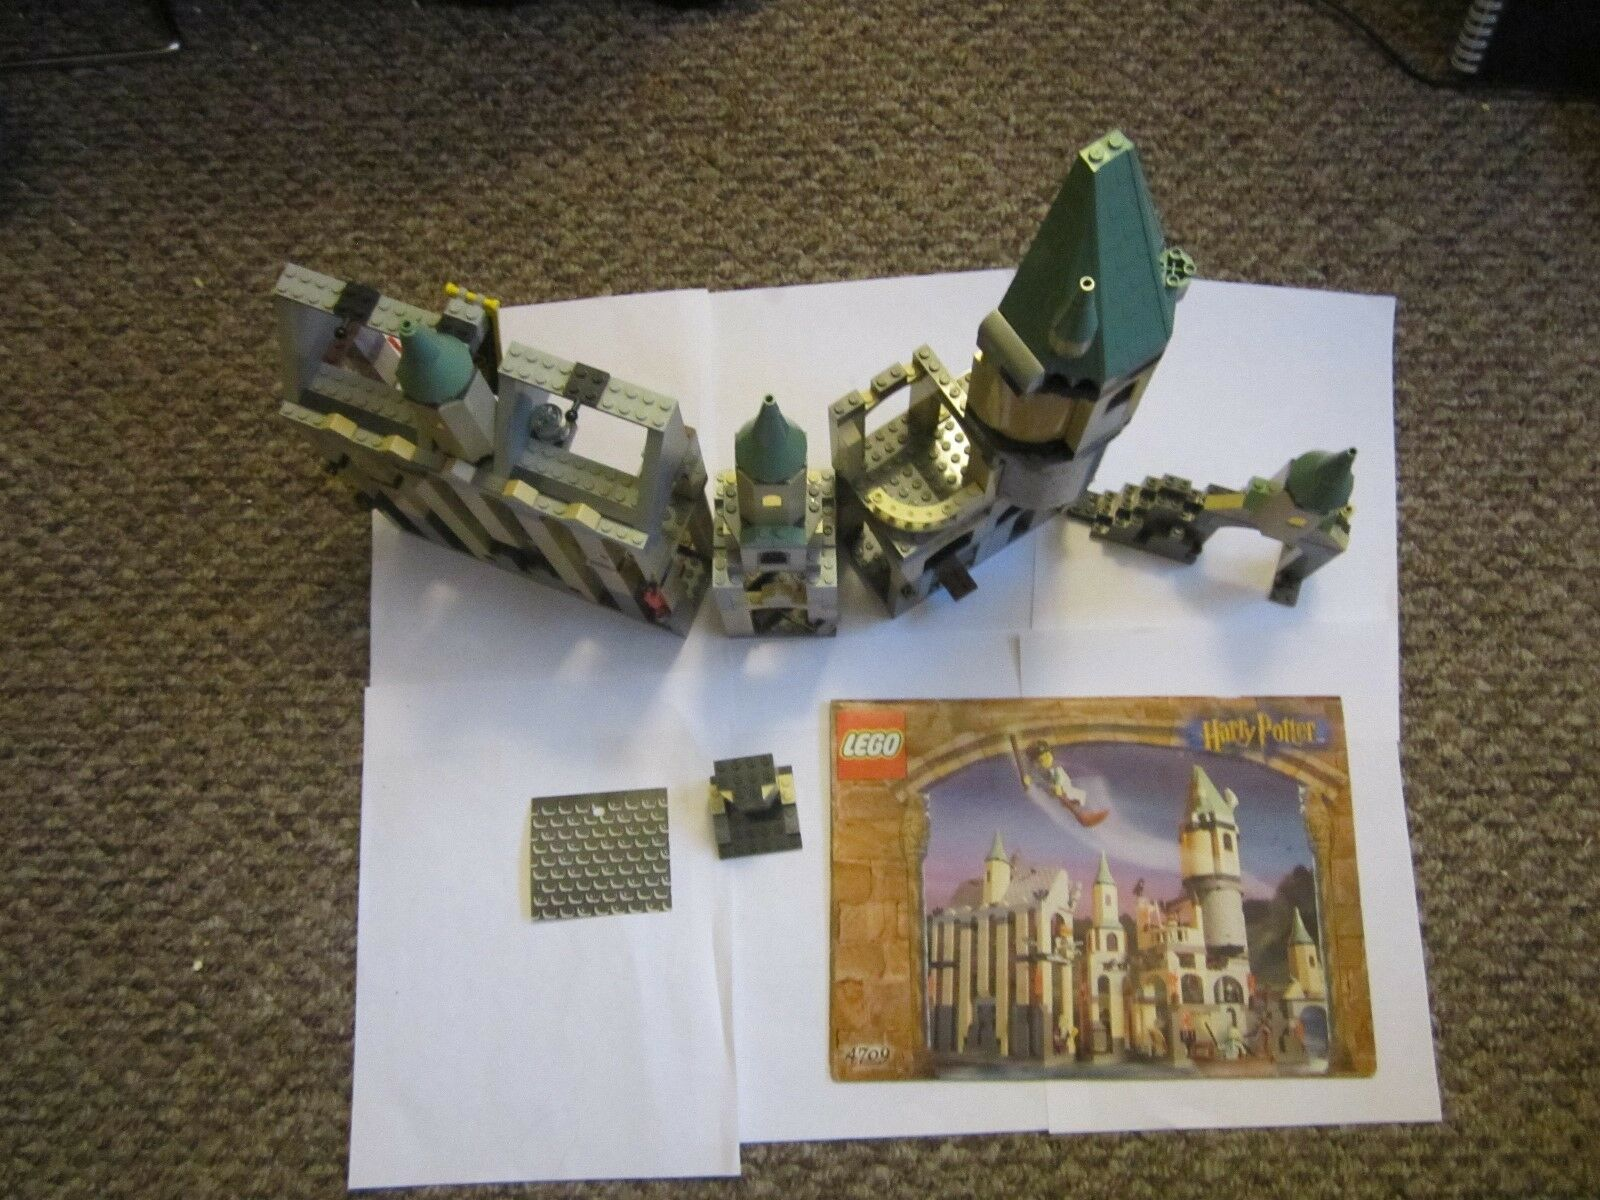 Lego Harry Potter Set 4709 Hogwarts Castillo Suelto Casi Completo Sin Minifiguras